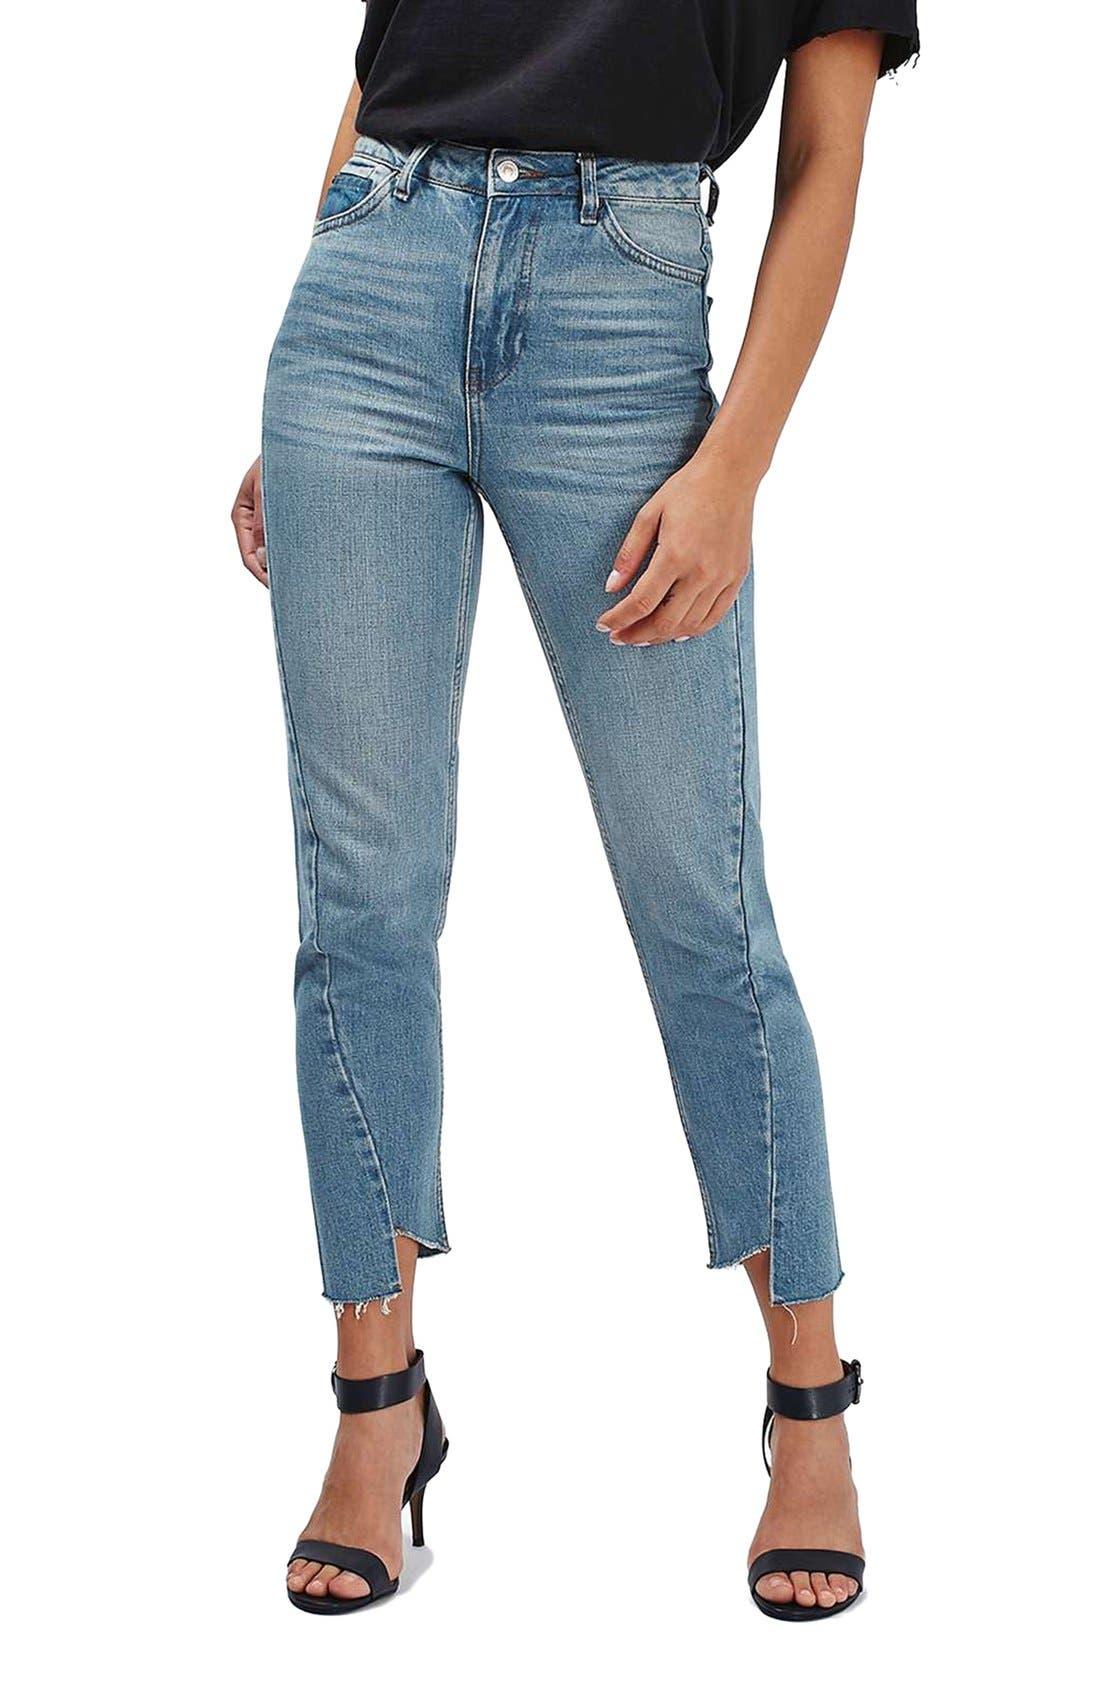 Mom Asymmetrical Step Hem Jeans,                             Main thumbnail 1, color,                             400